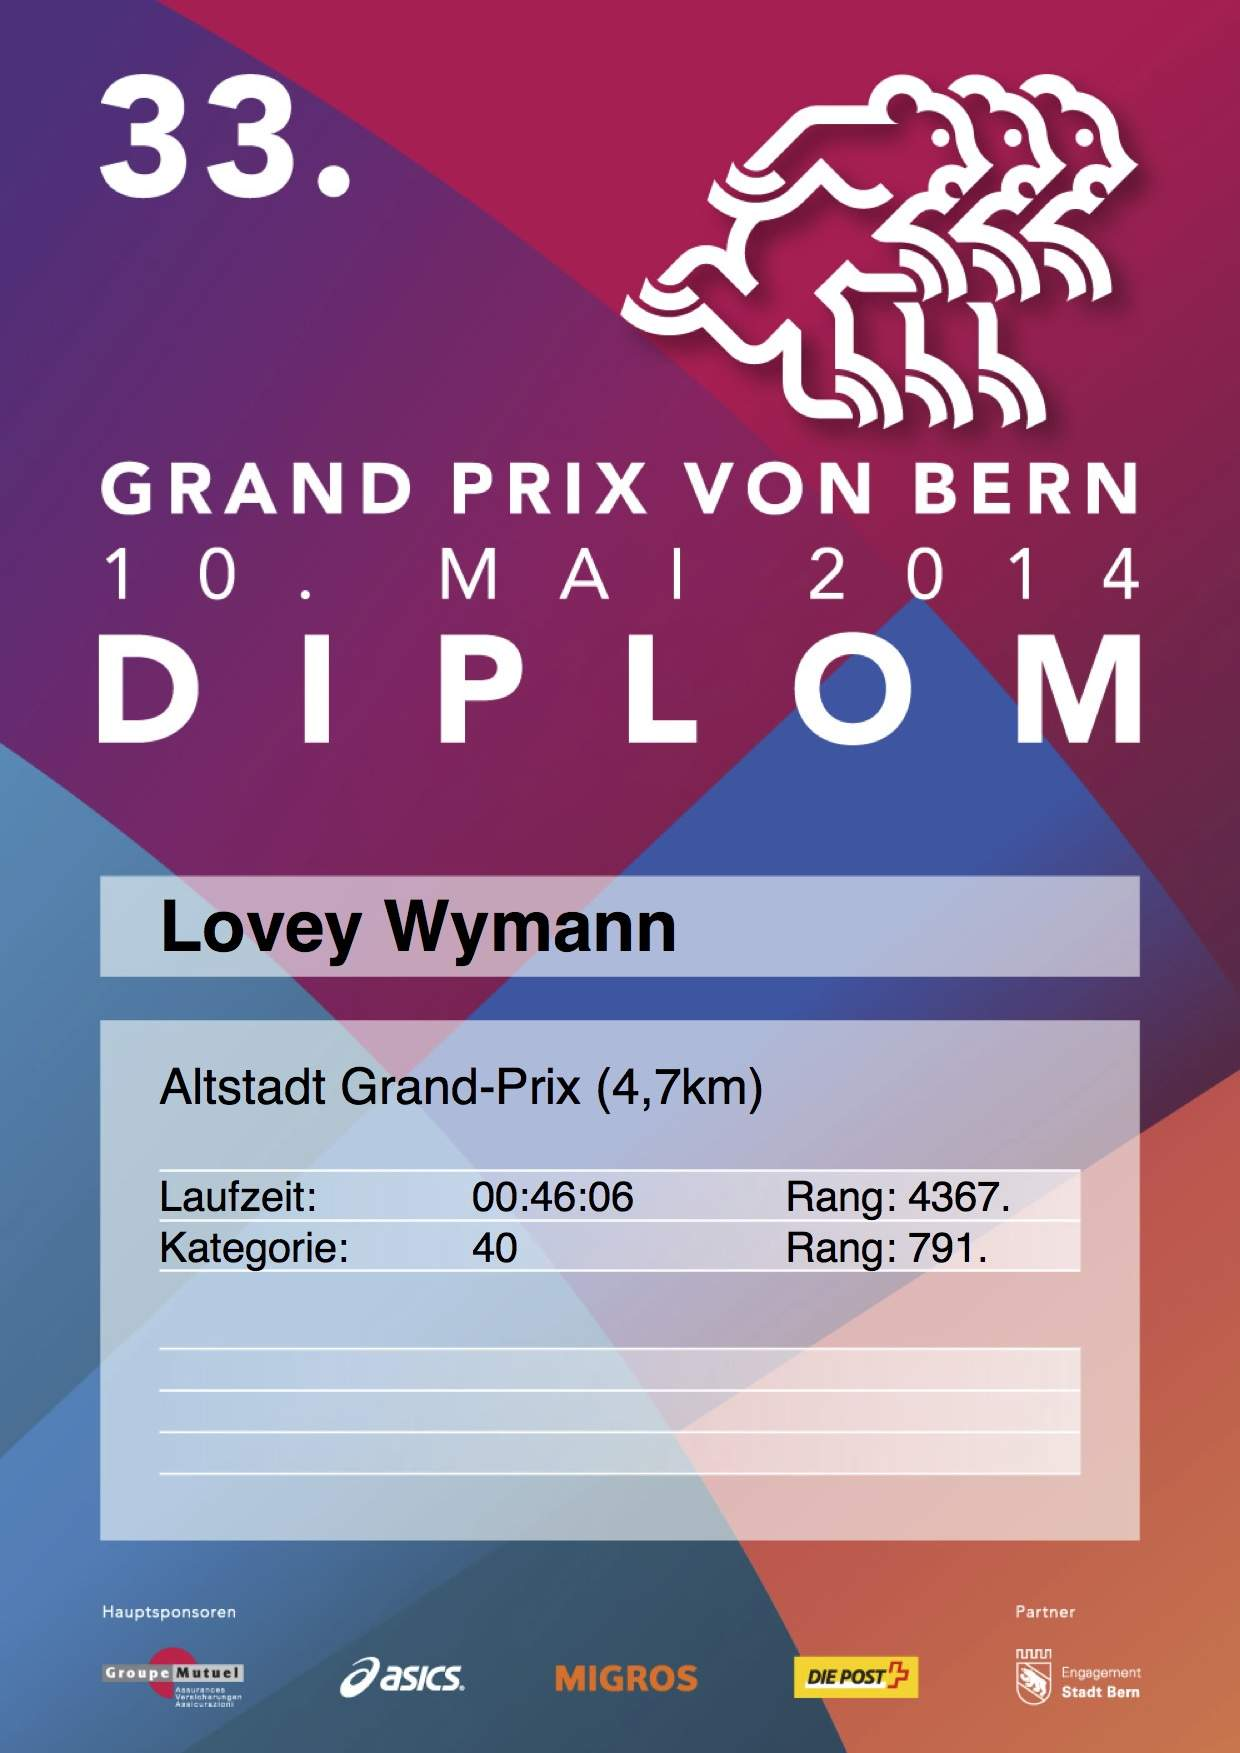 Diplom #GBBern 2014